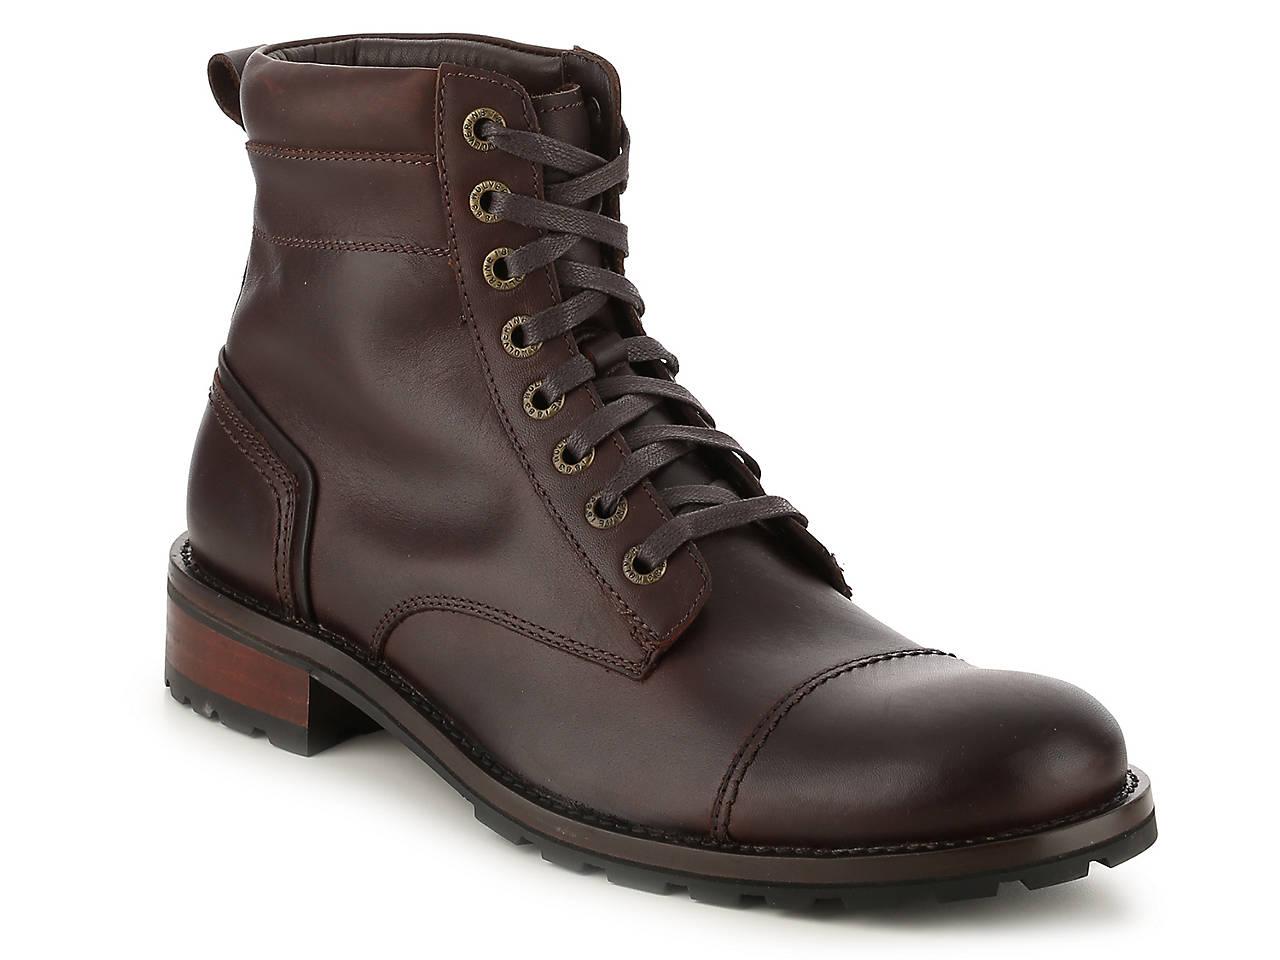 fa043a874d0 Reese Cap Toe Boot